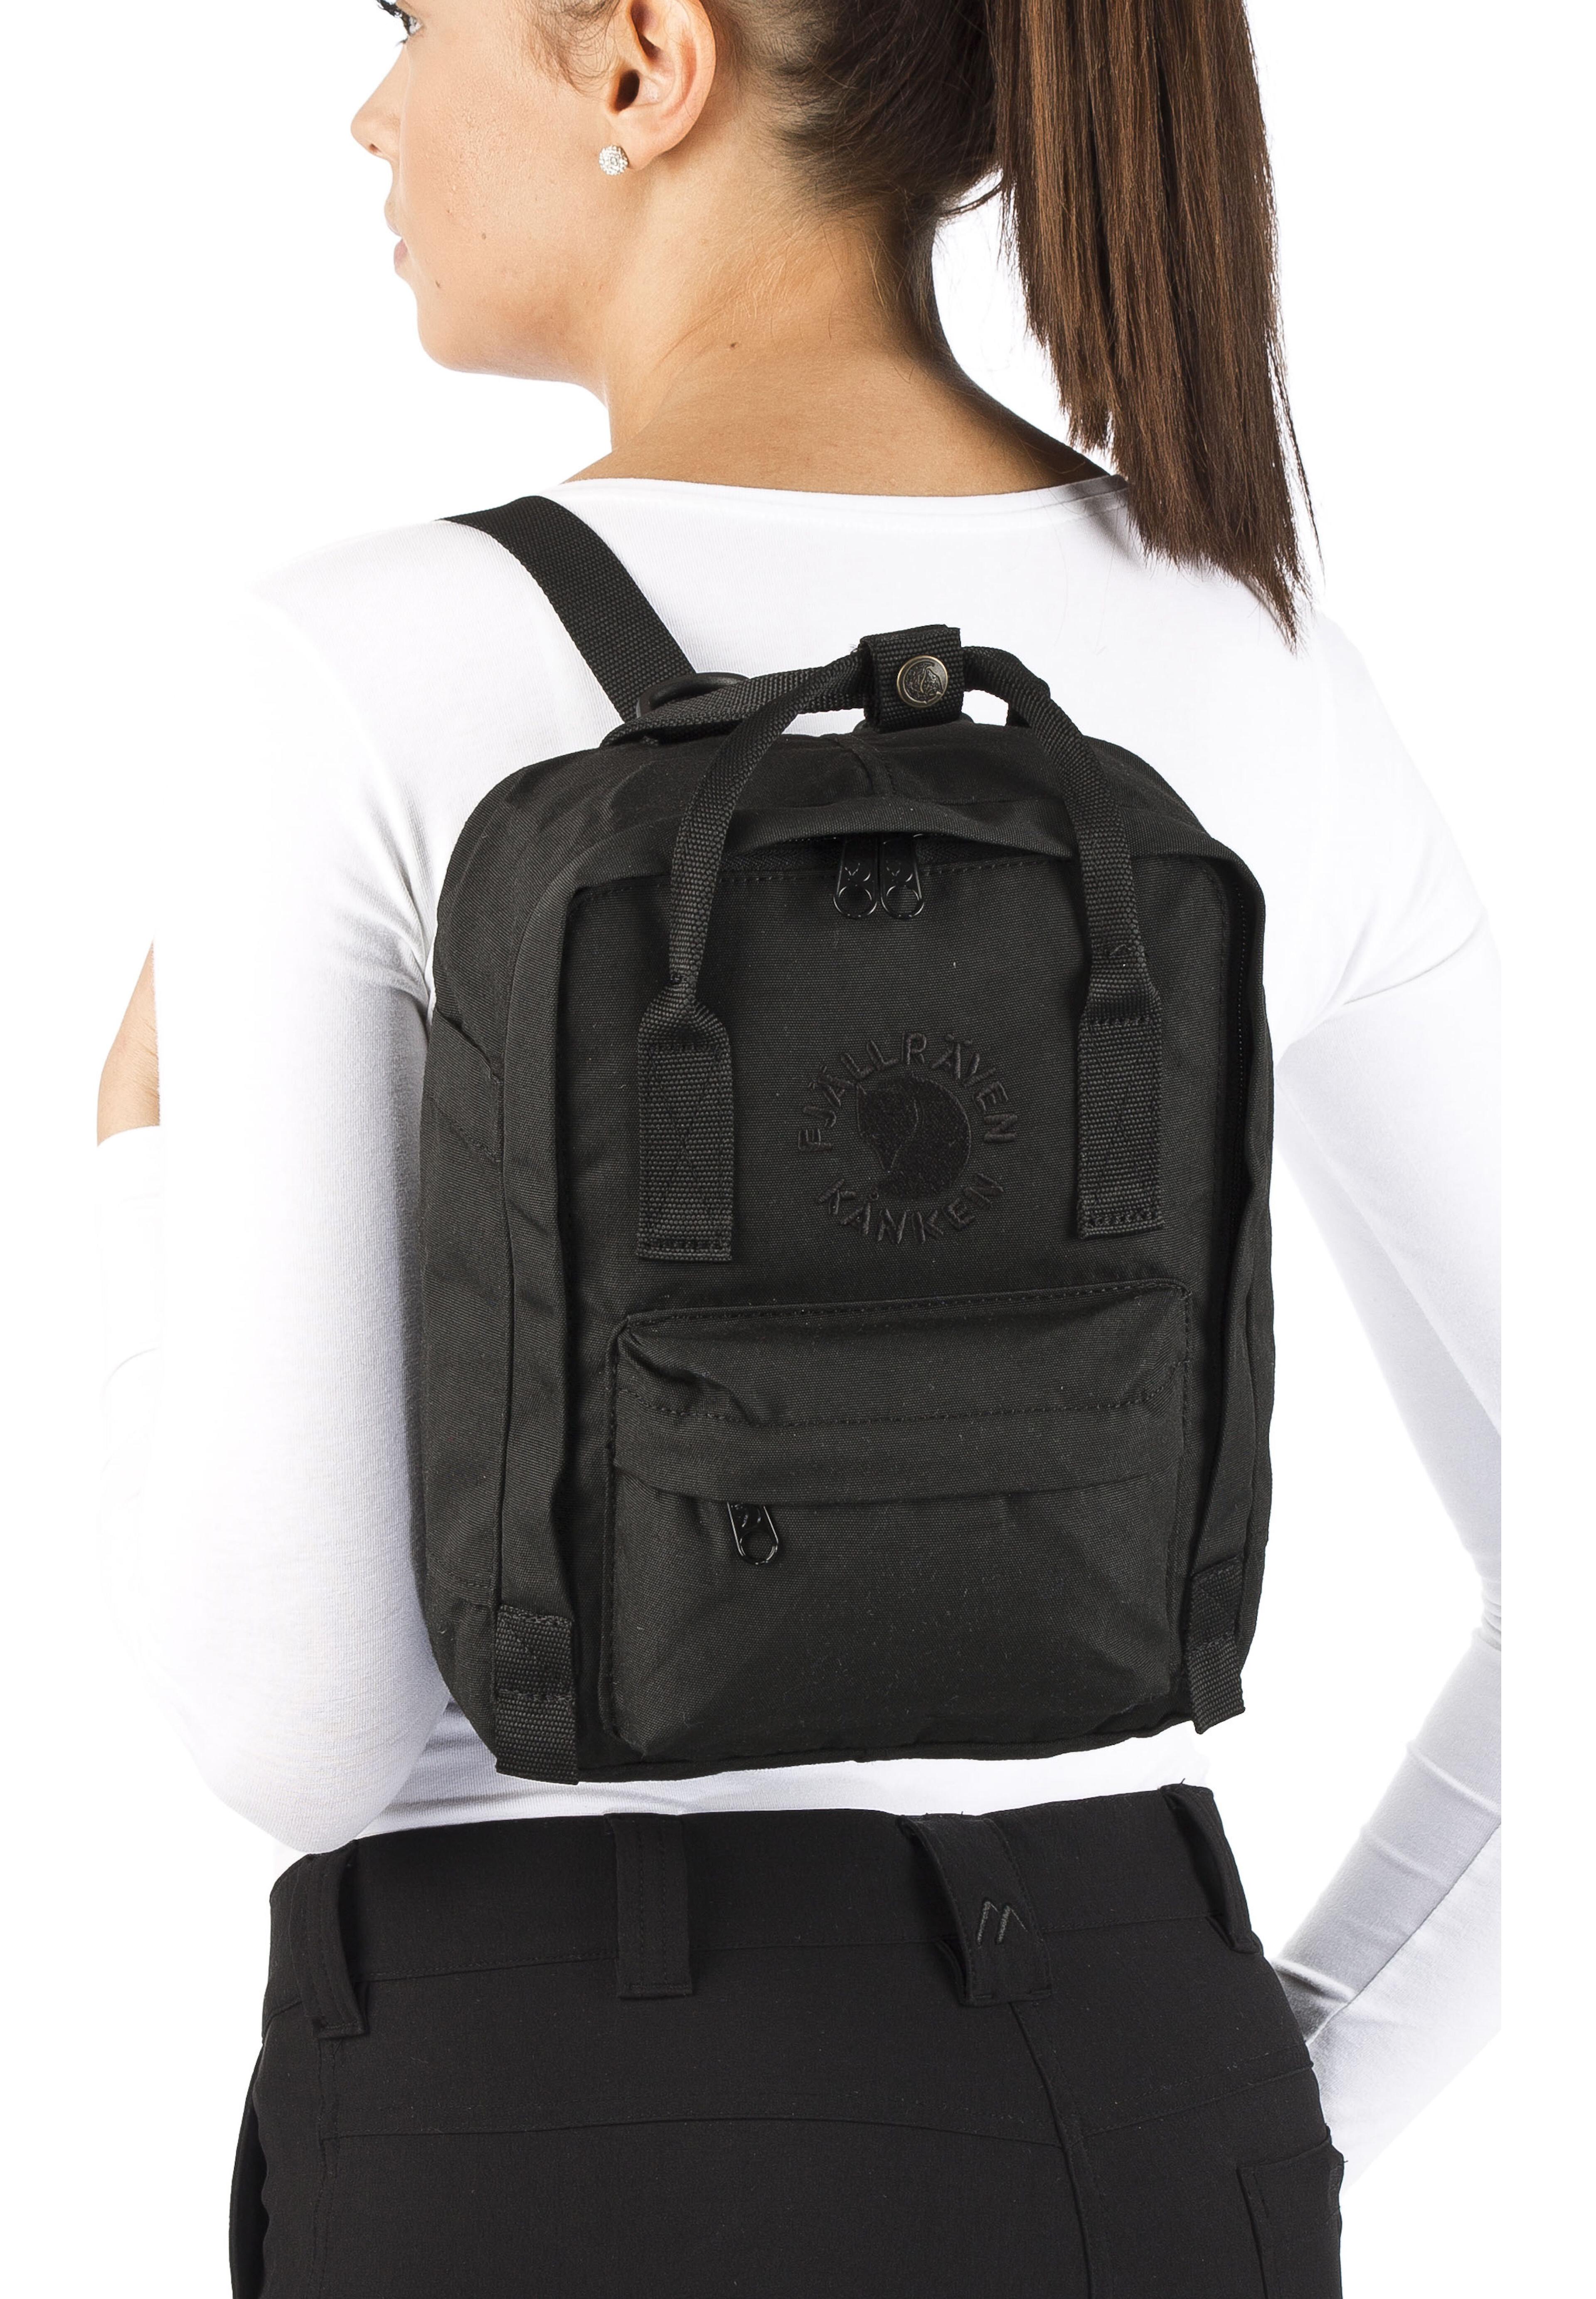 a75f7d60a38a Fjällräven Re-Kånken Mini Backpack black at Addnature.co.uk